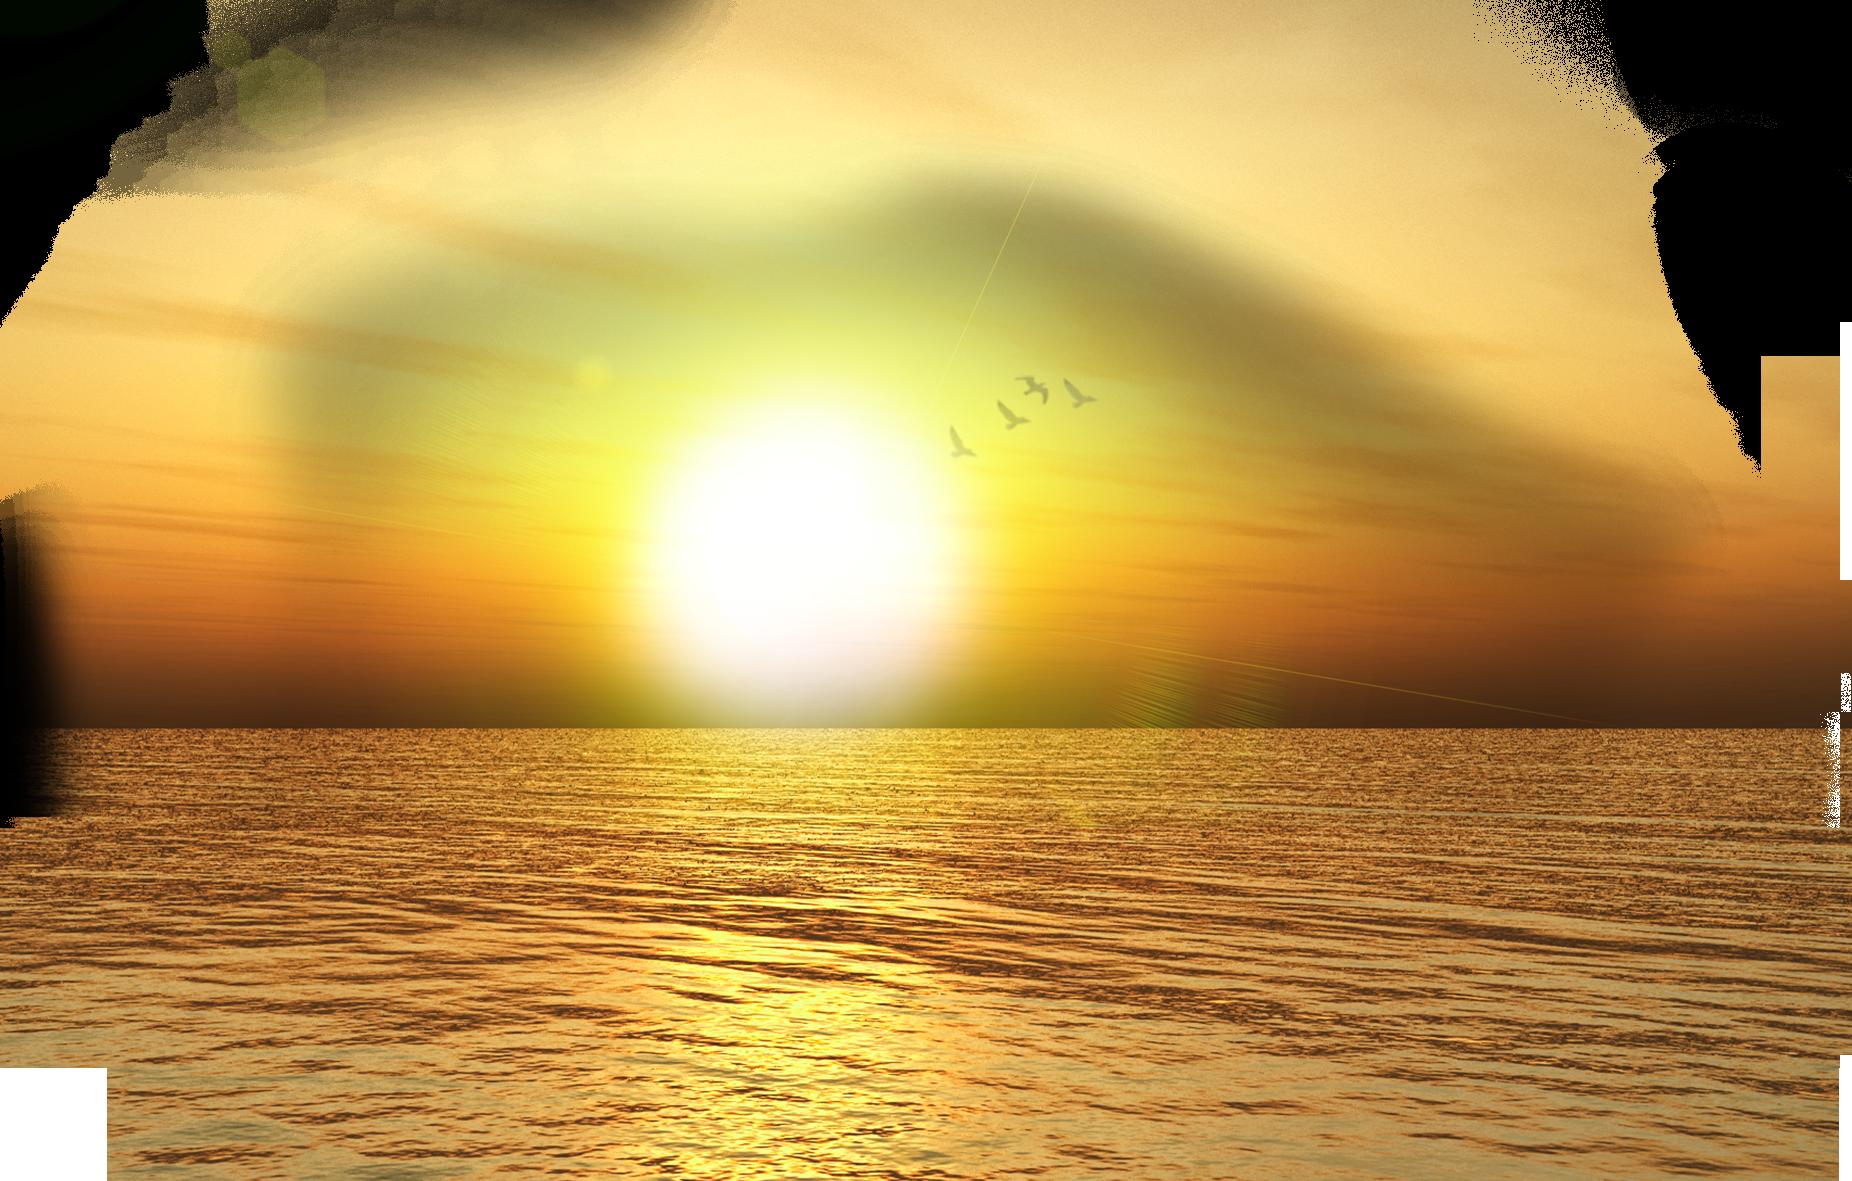 Sunrise PNG Images Transparent Free Download.